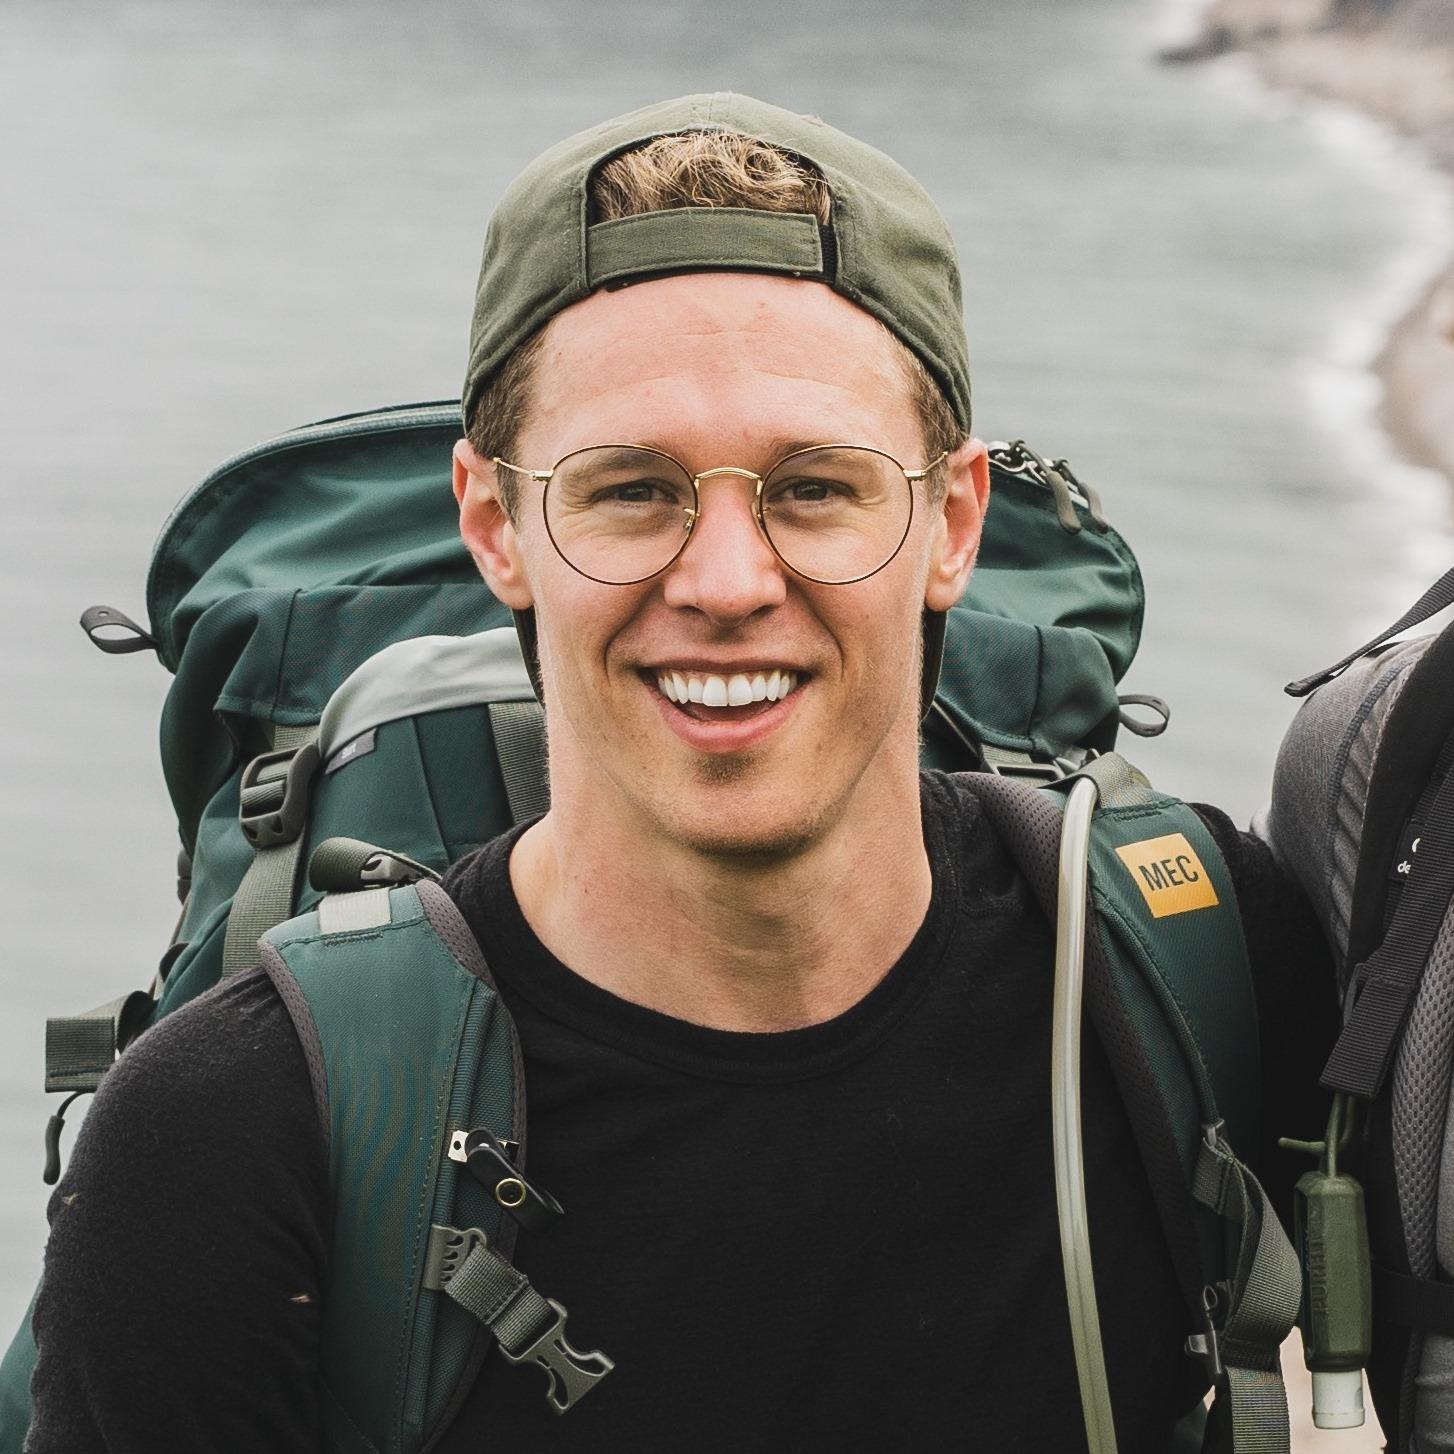 Brandon Toner A pharmacist, manager, student, community volunteer, curler, hiker, tinkerer and whatever else.